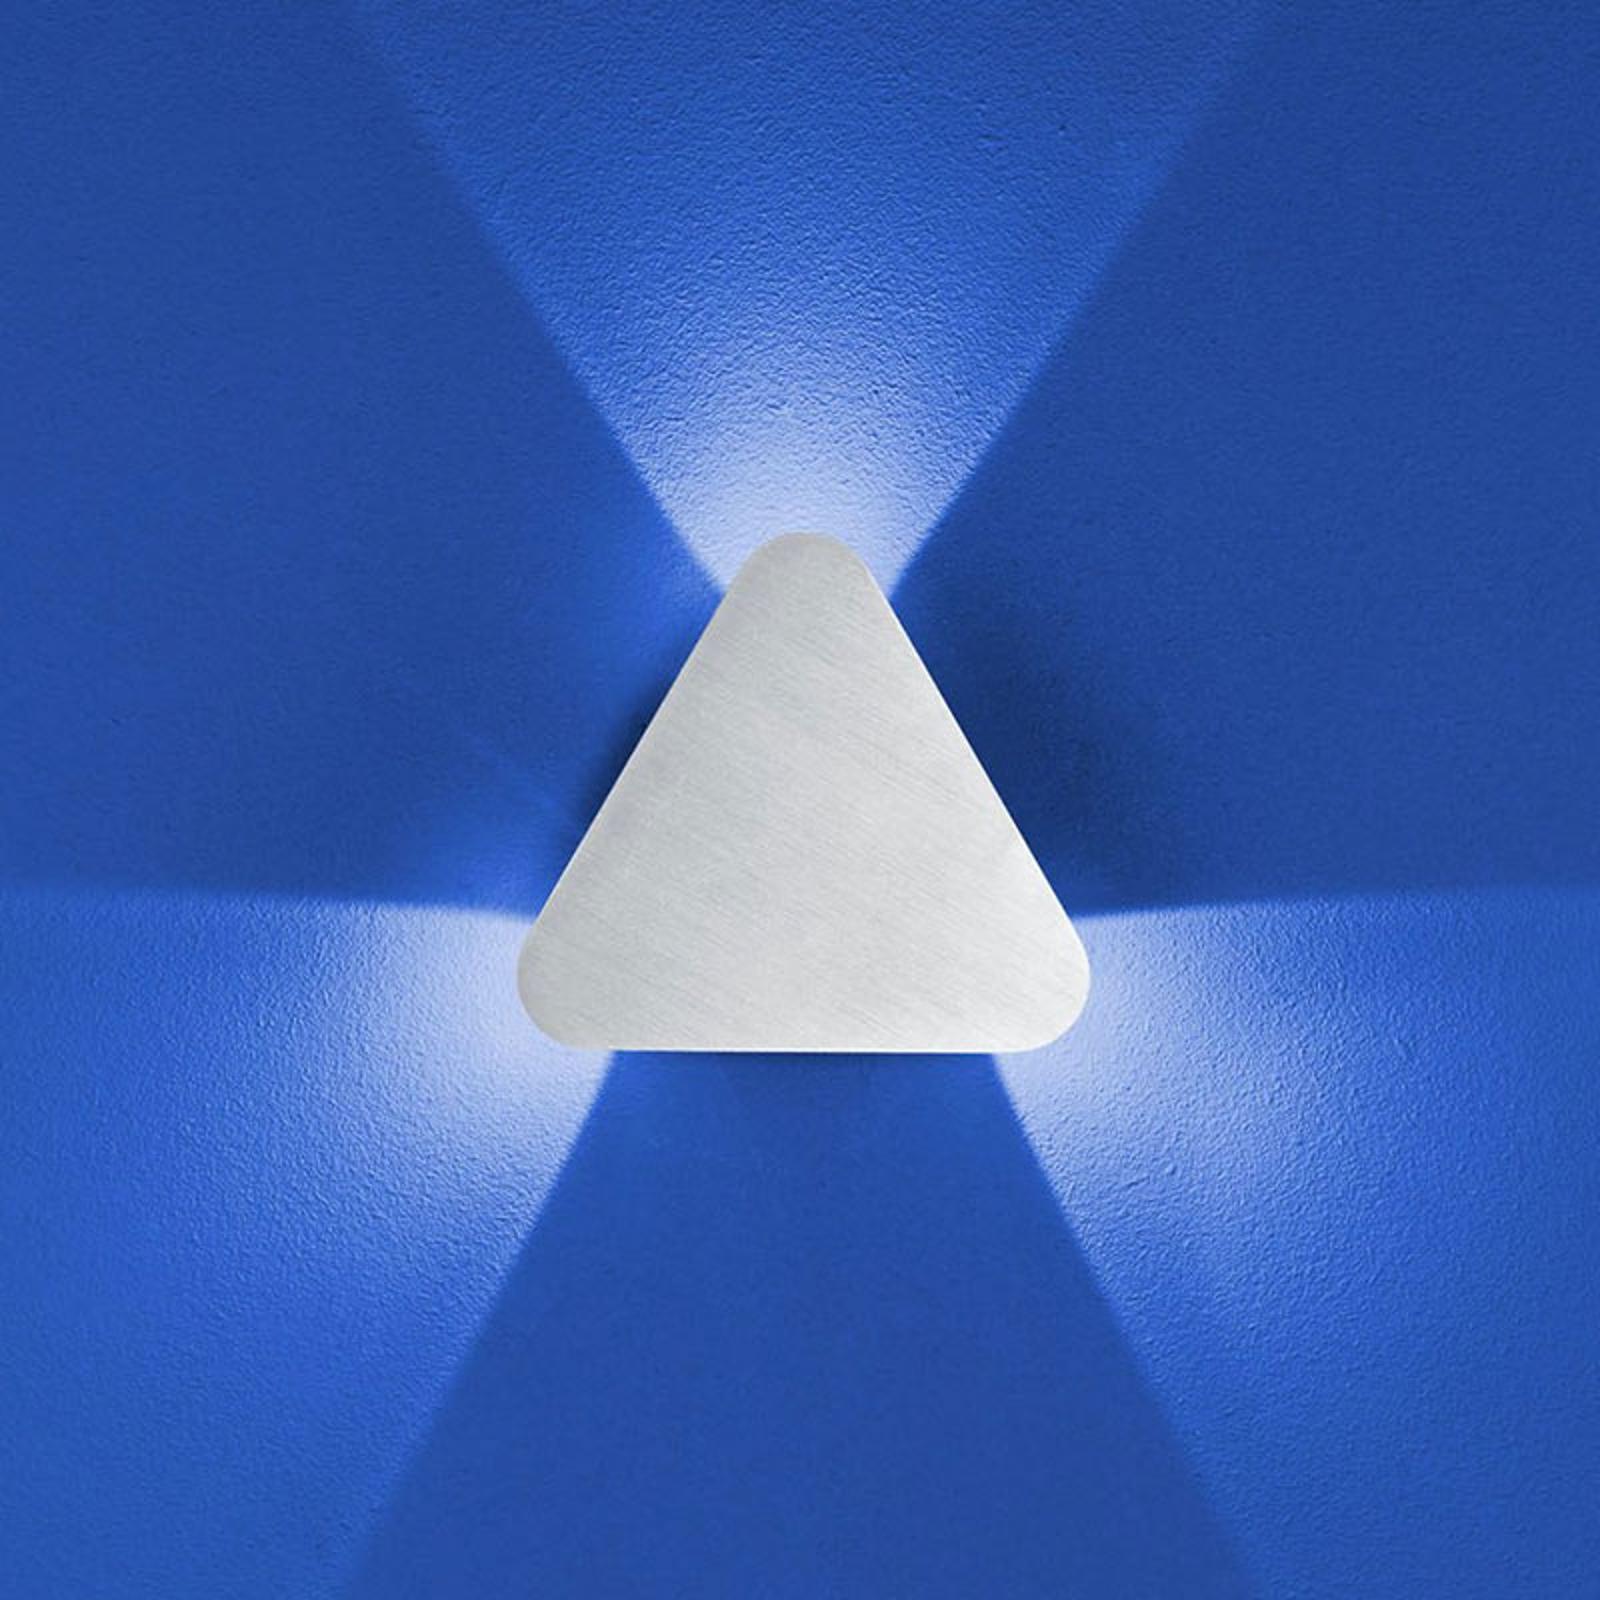 B-Leuchten Prince Wandleuchte IP54, dreieckig